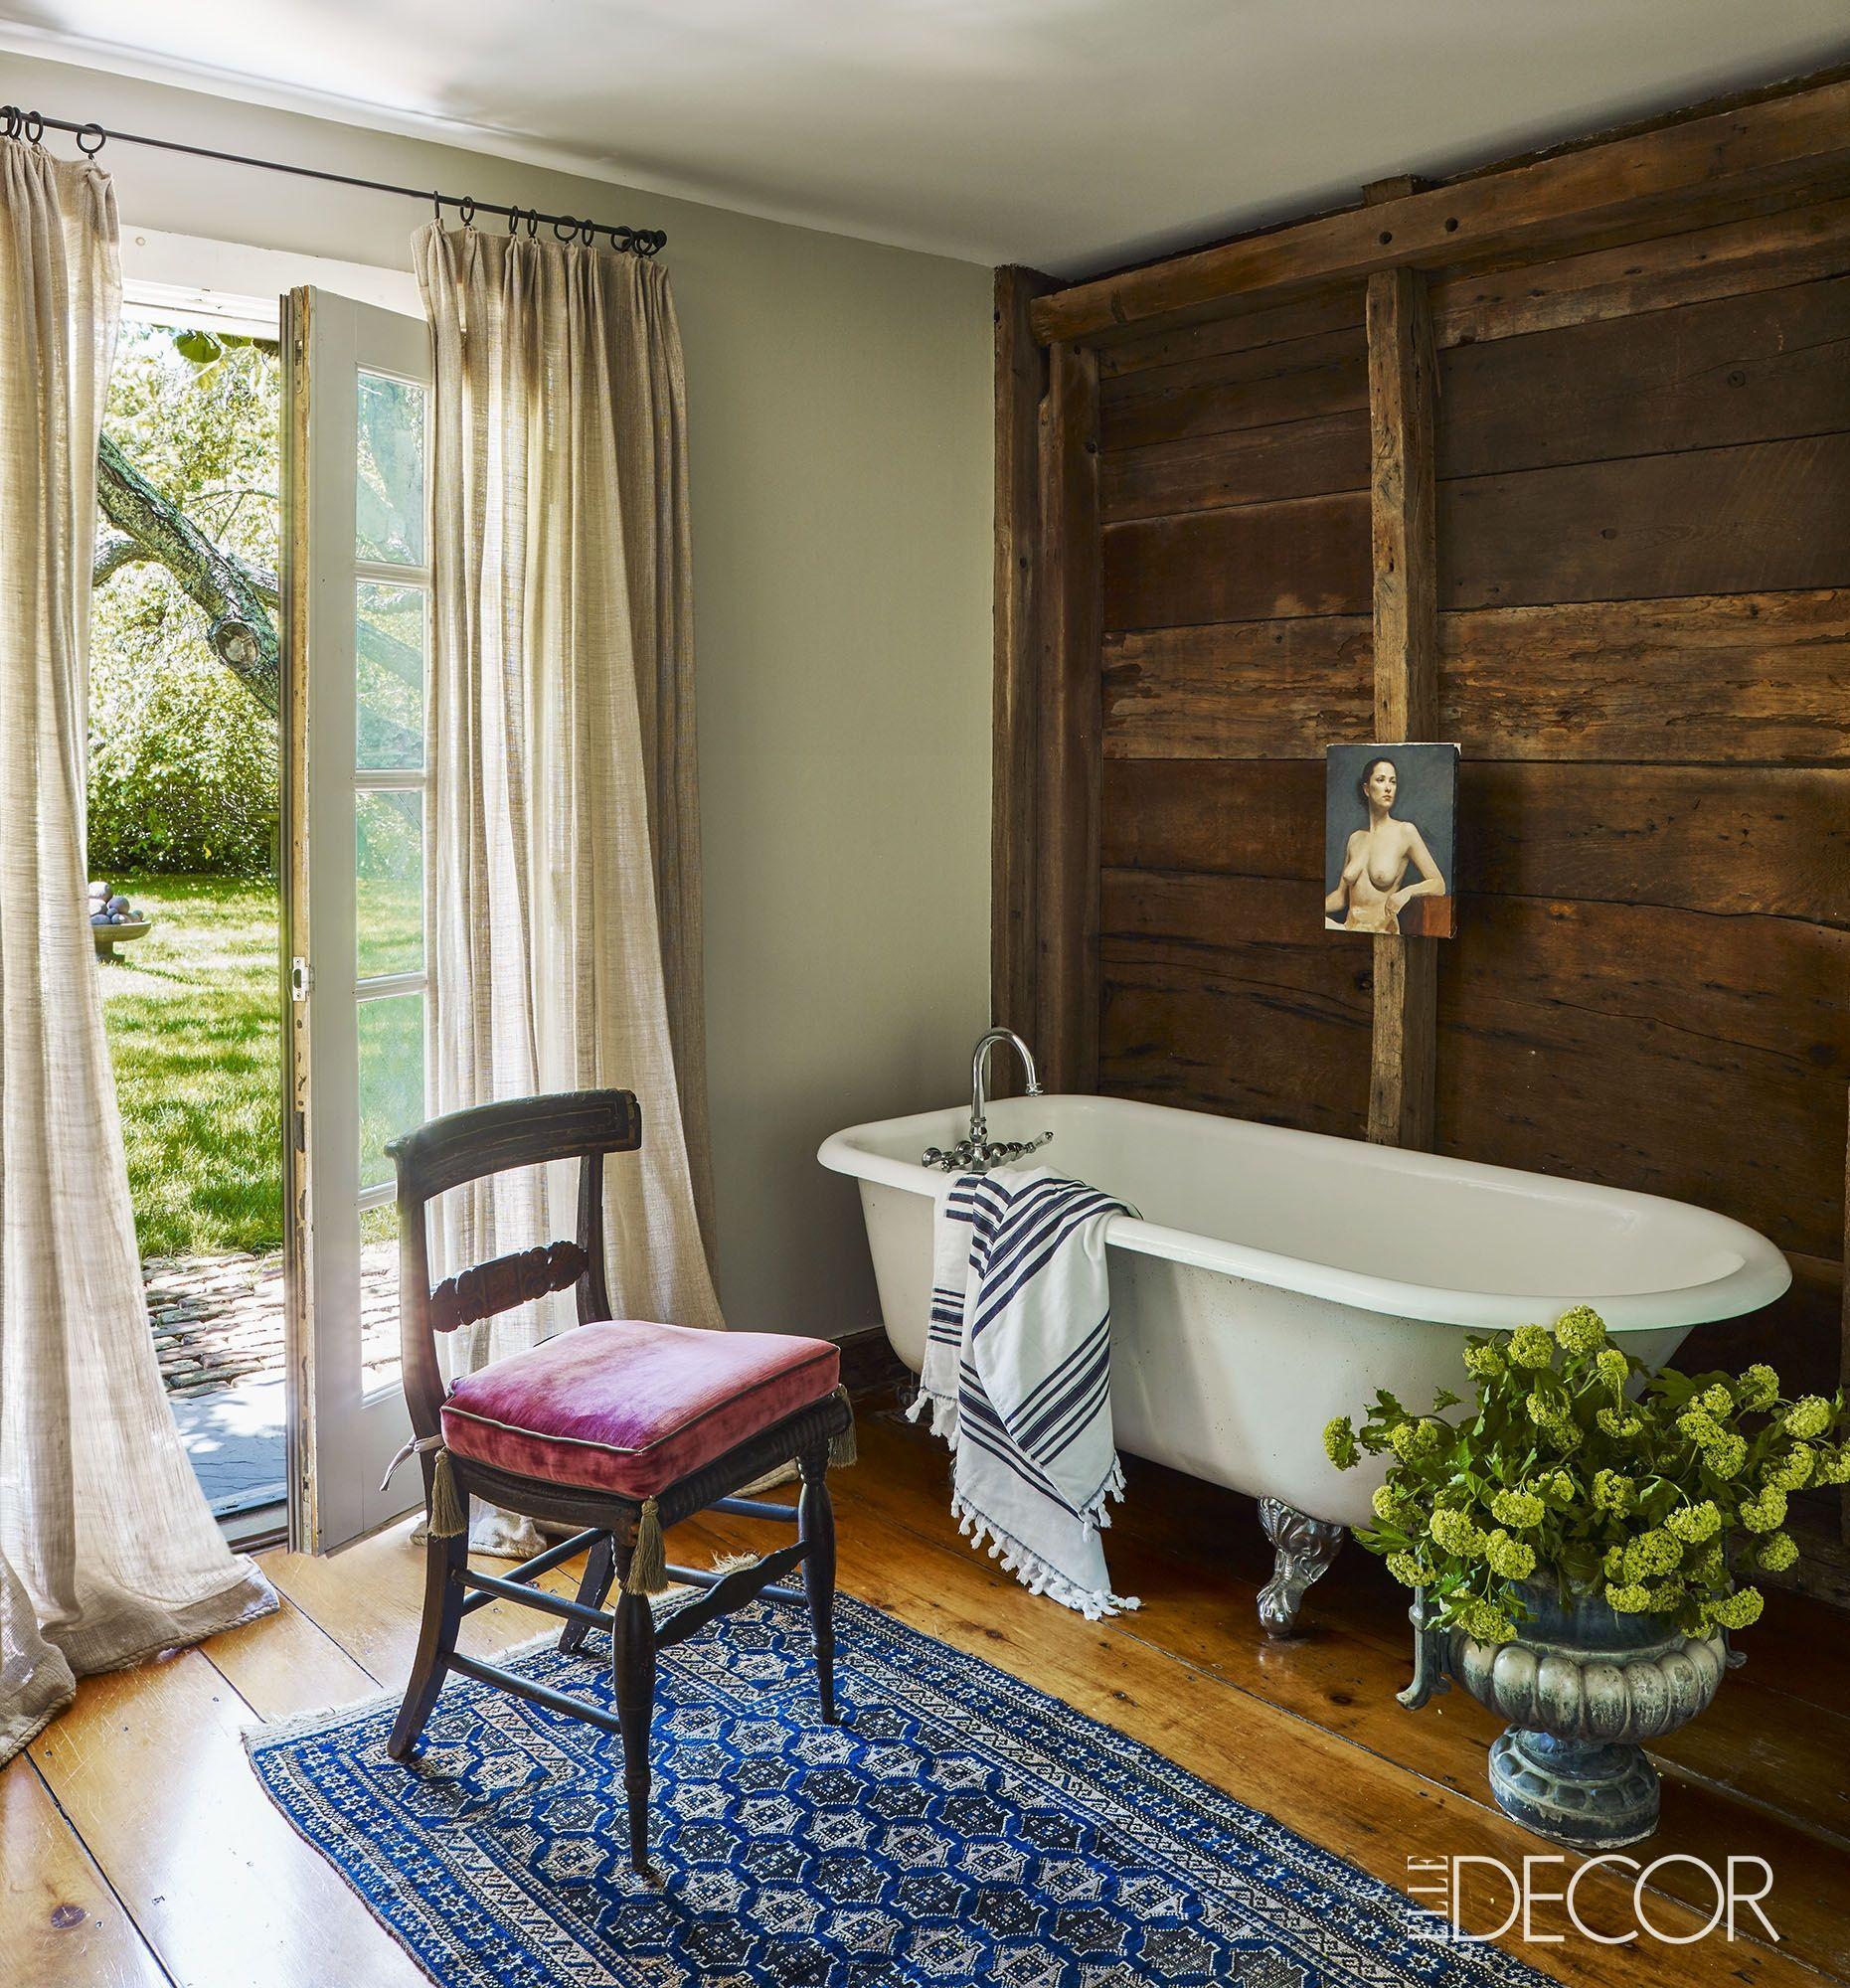 20 Ideas For Rustic Bathroom Decor